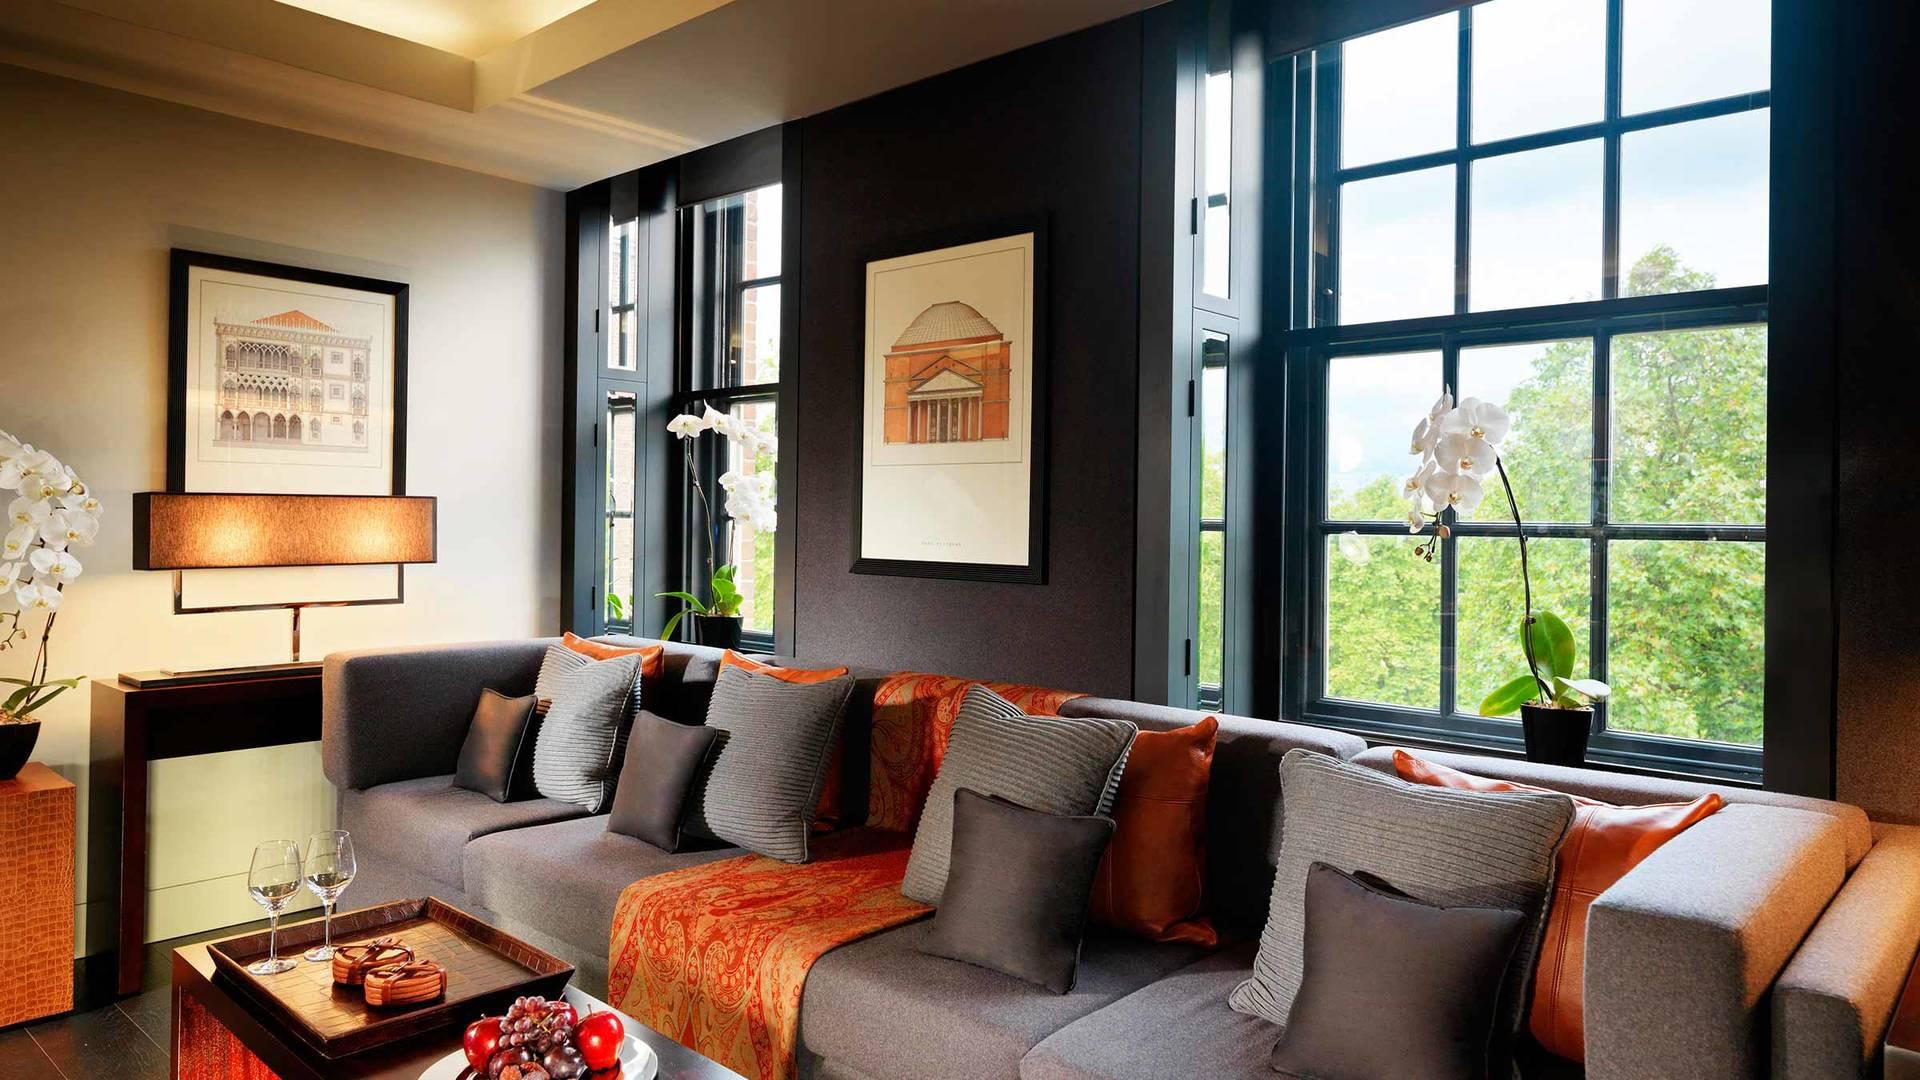 sofas  One Bedroom park